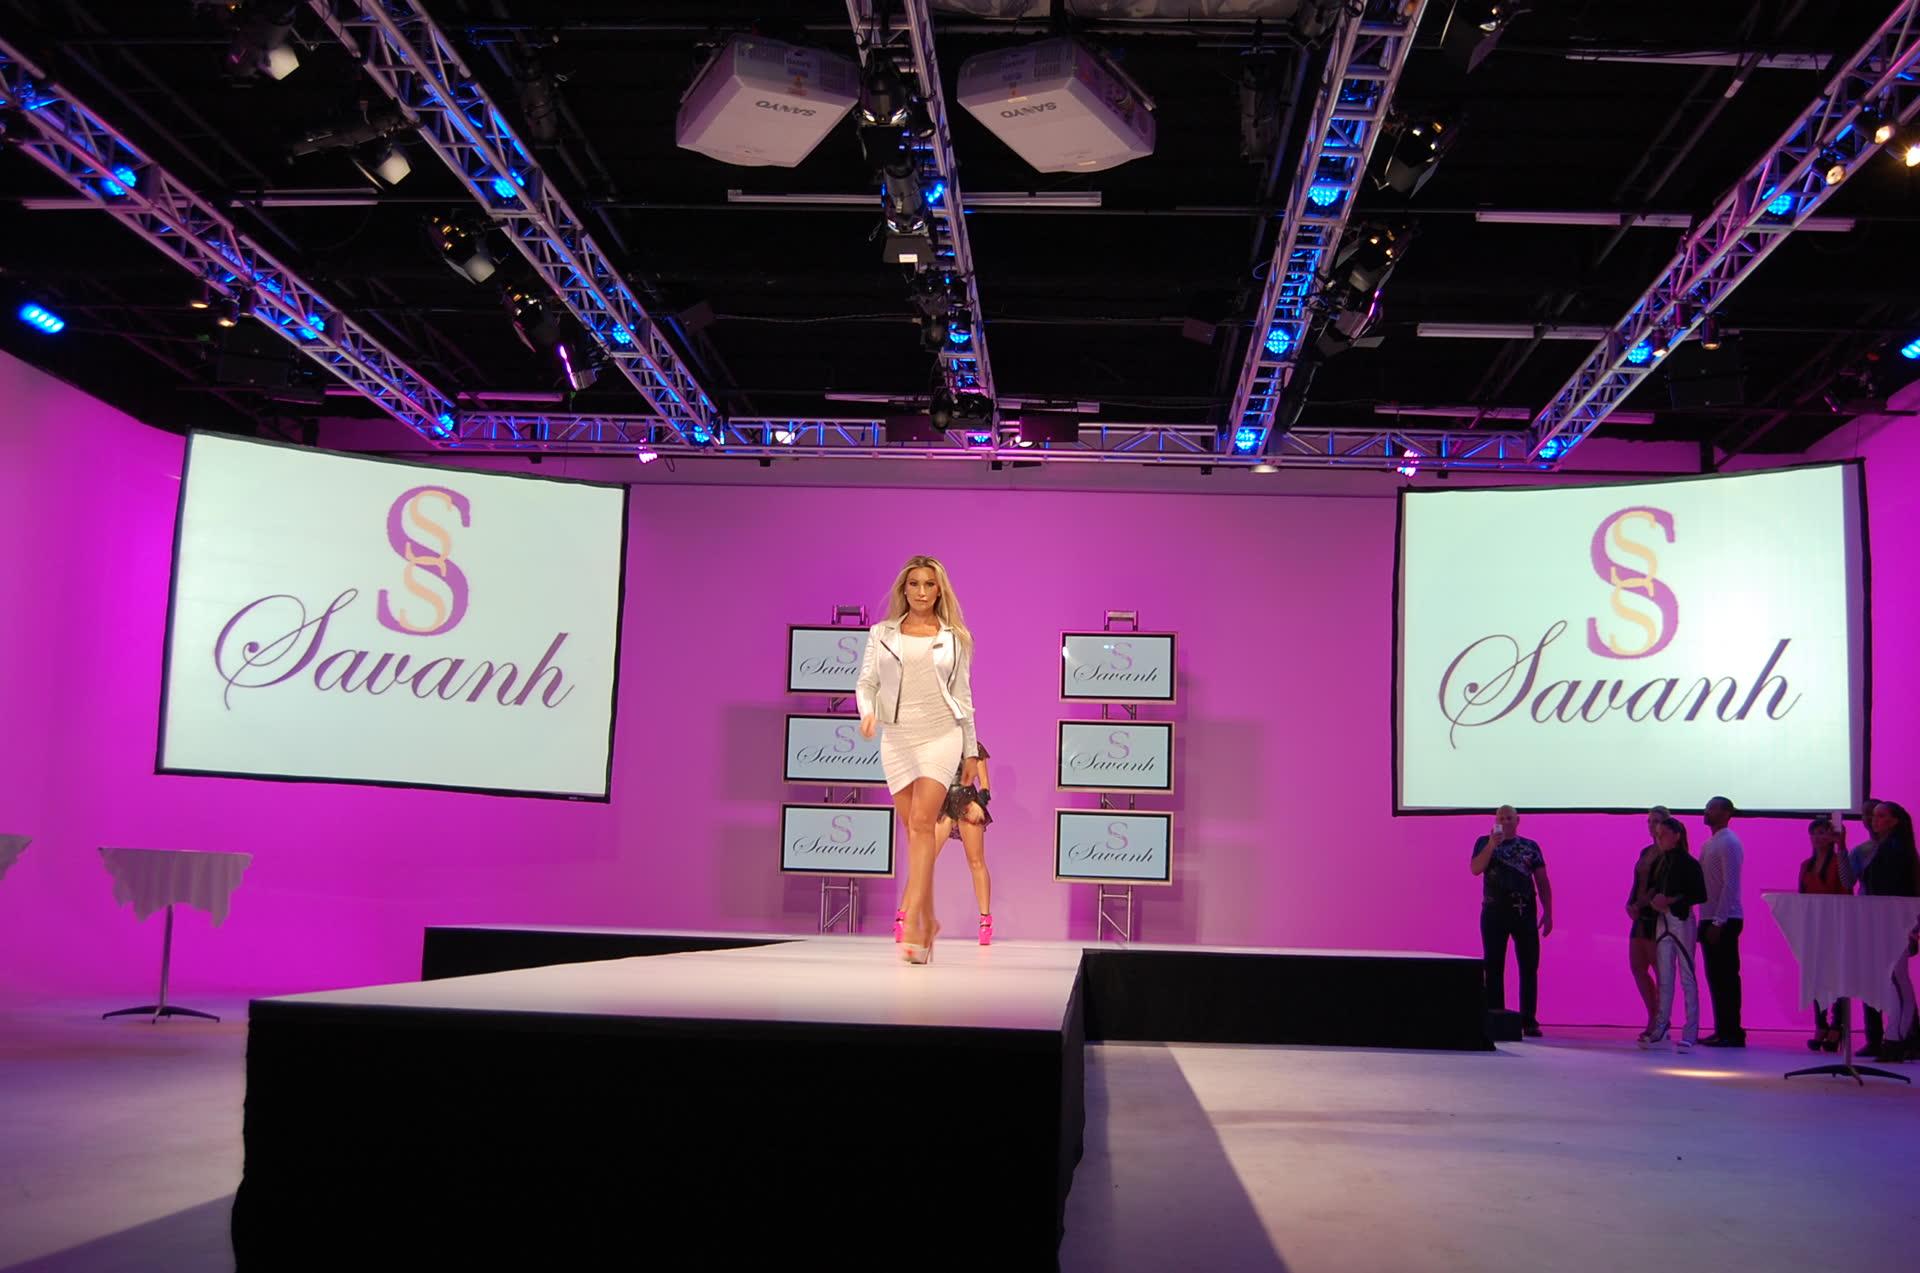 Fashion Show venues